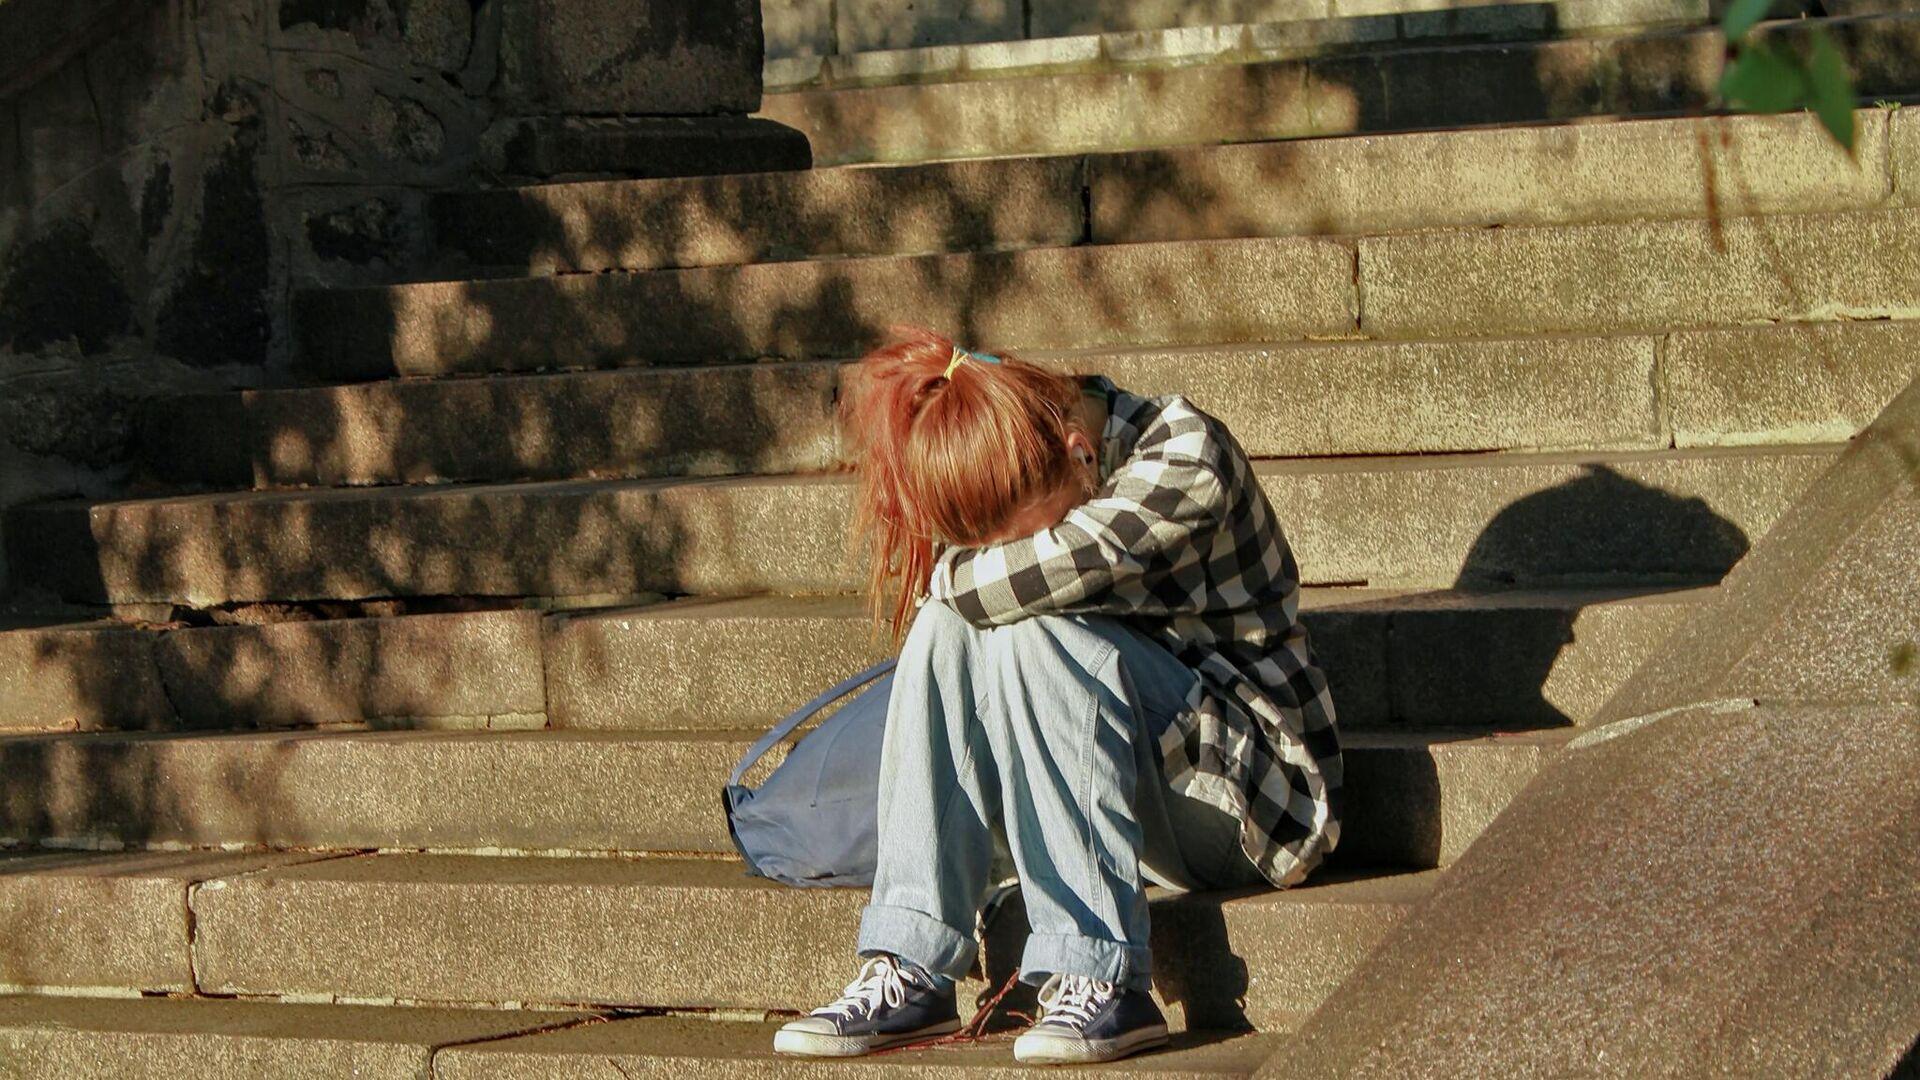 Una chica llorando (imagen referencial) - Sputnik Mundo, 1920, 27.05.2021